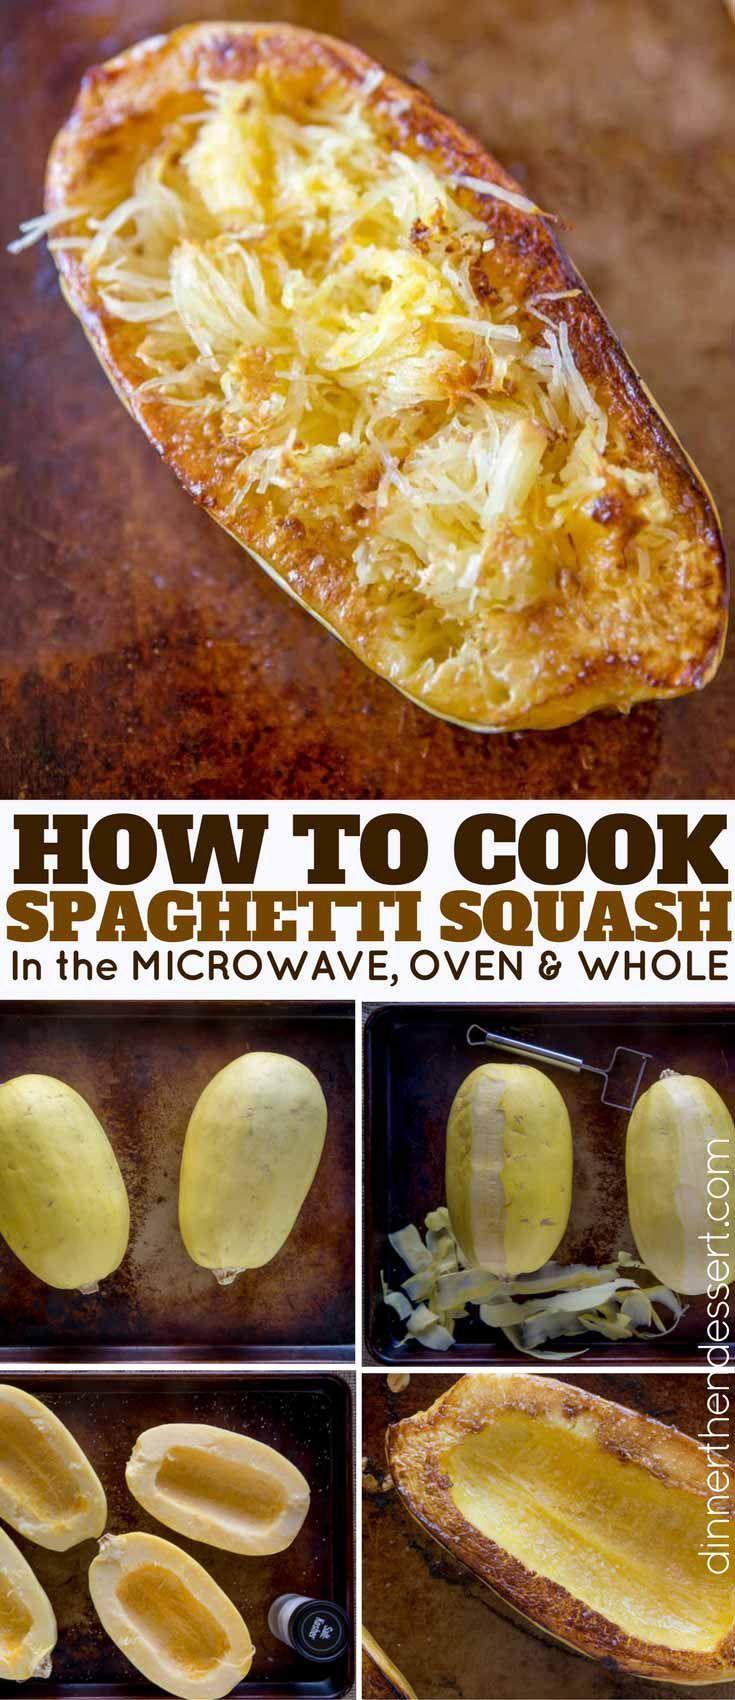 How to Cook Spaghetti Squash (+Spaghetti Squash Recipes!}